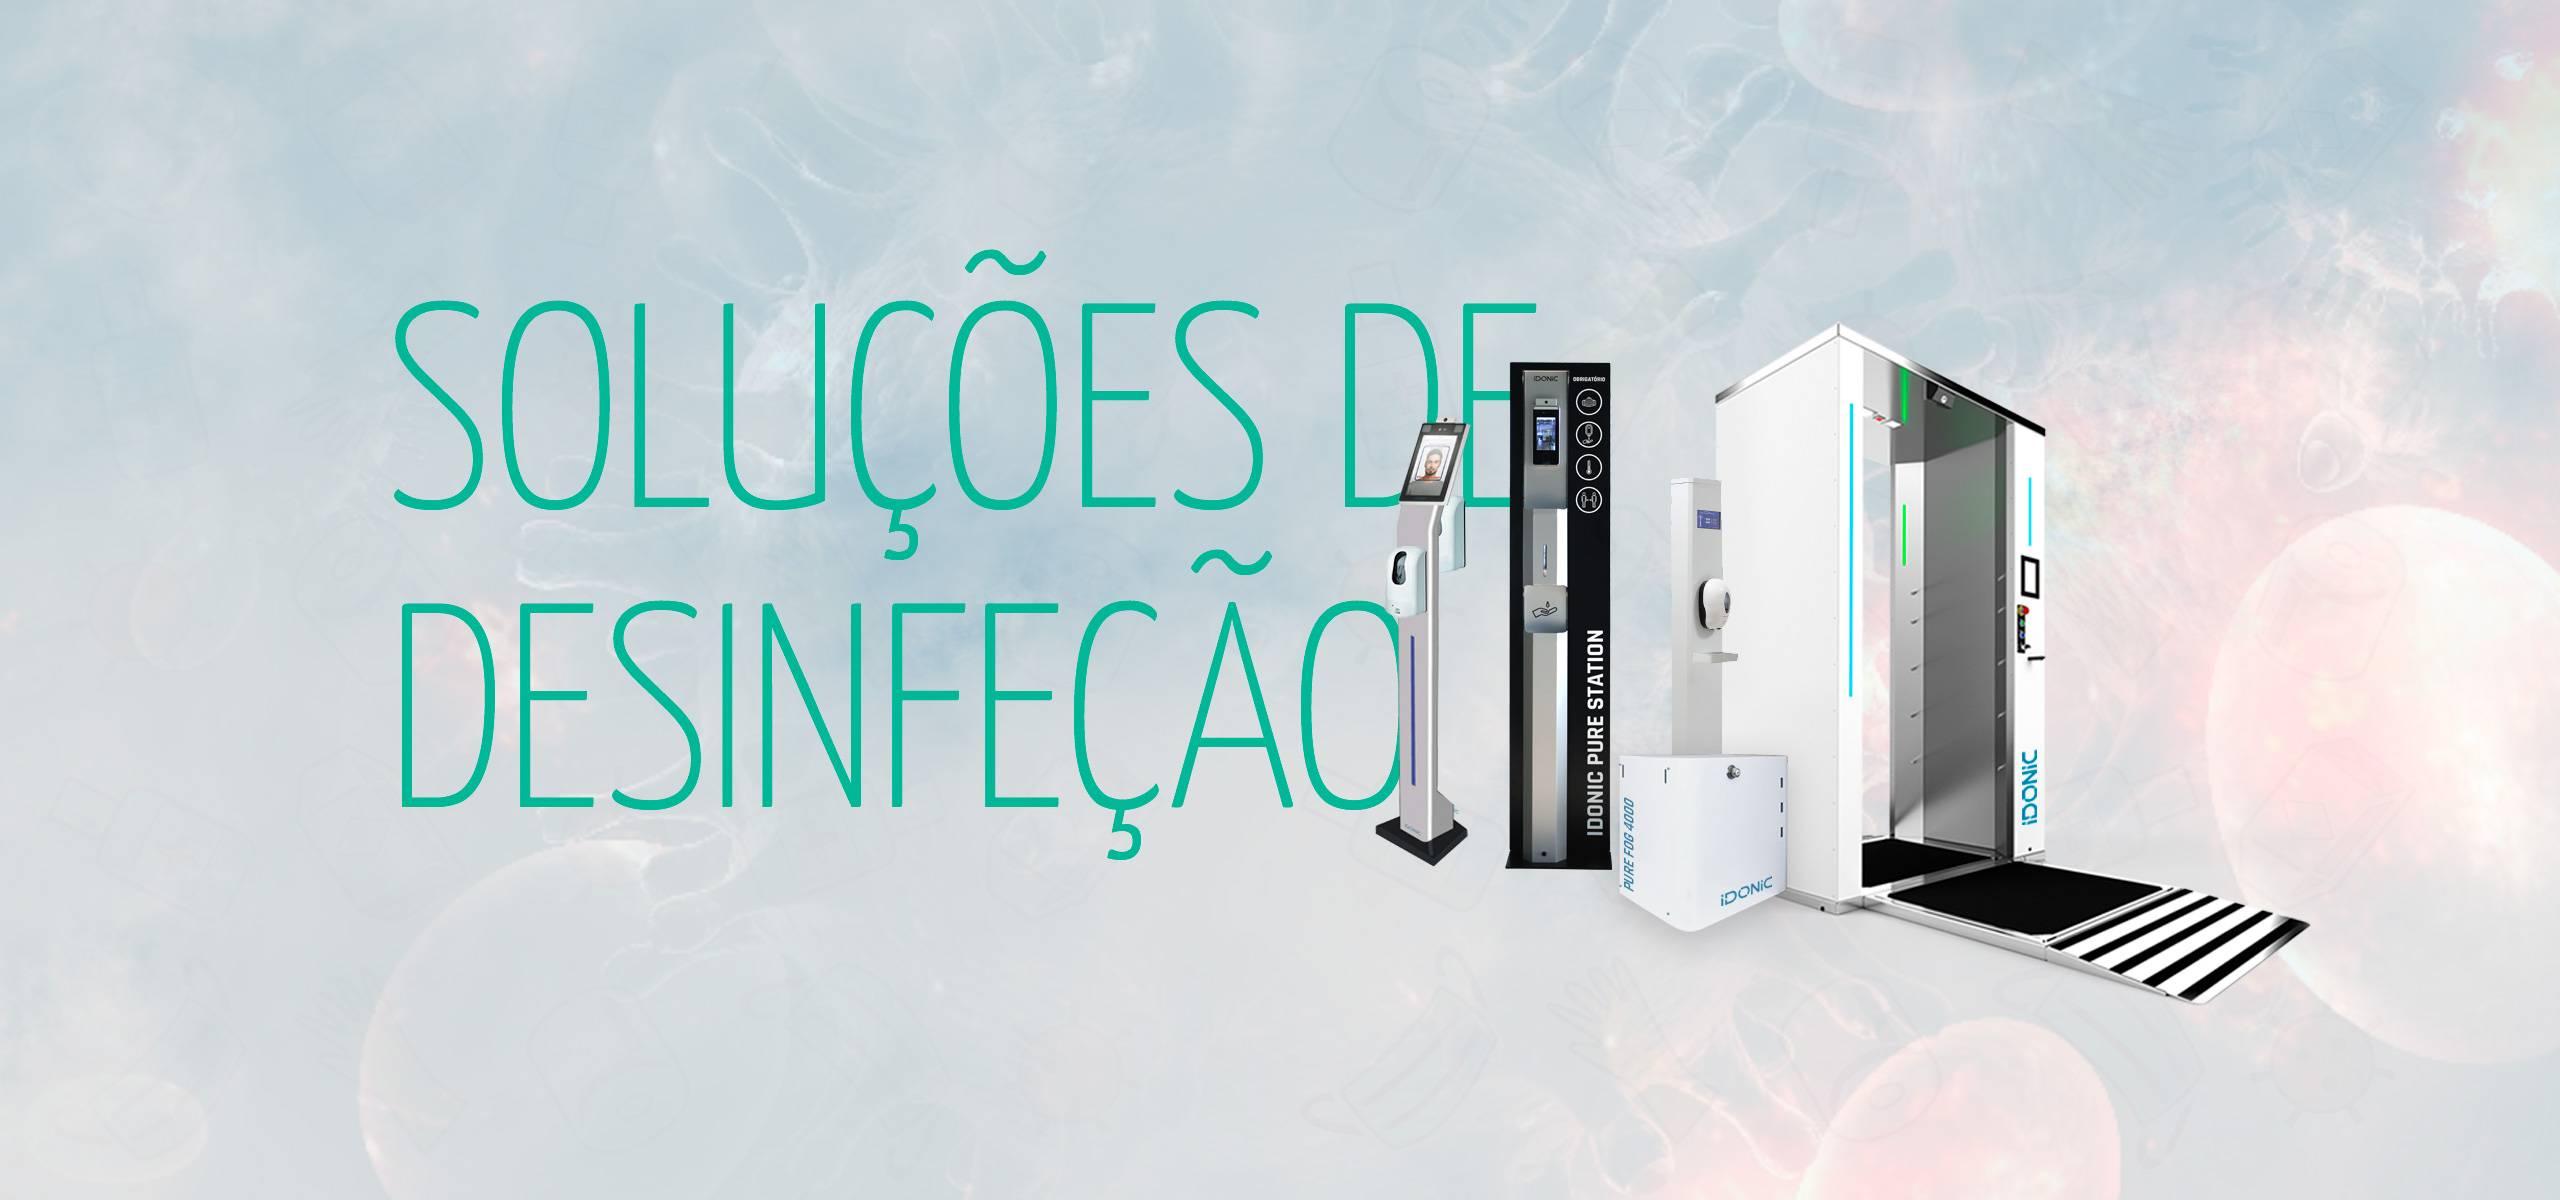 idonic-solucoes-de-desinfecao-banner-new